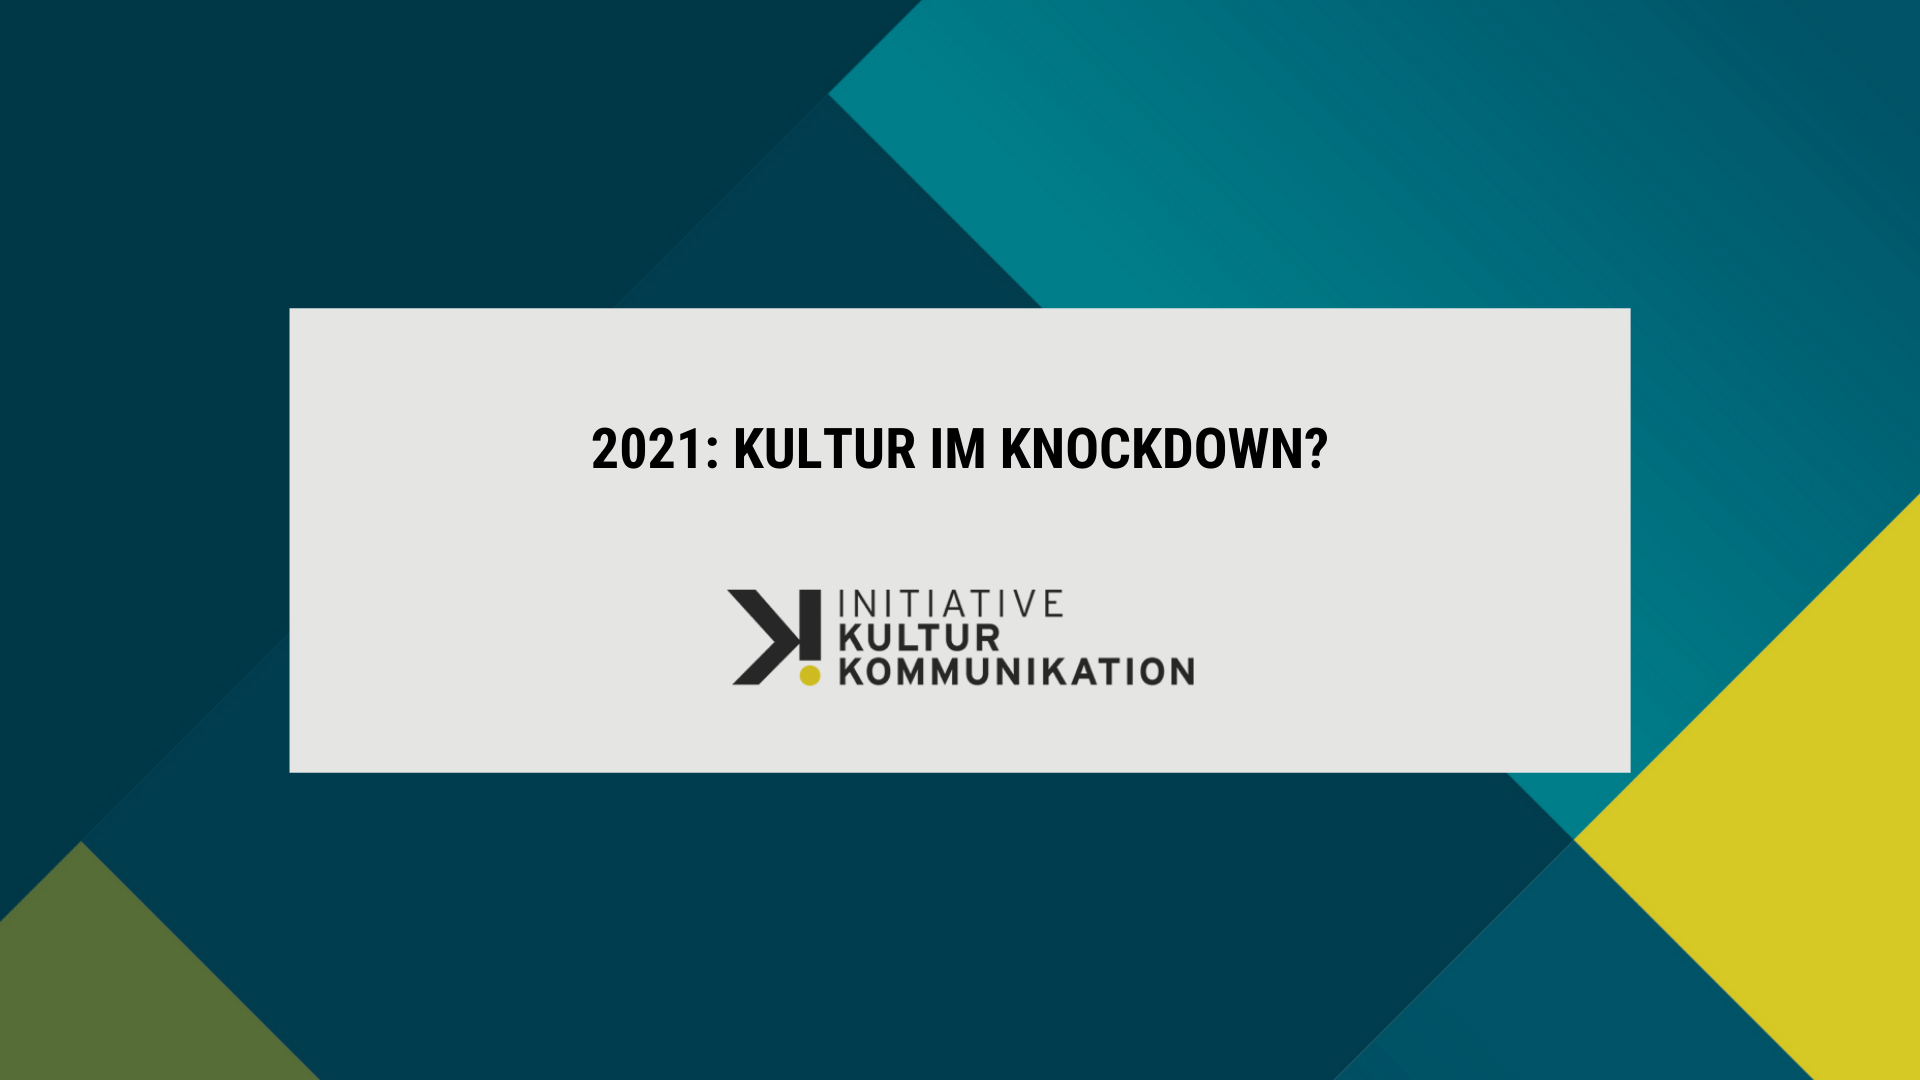 2021: Kultur im Knockdown?